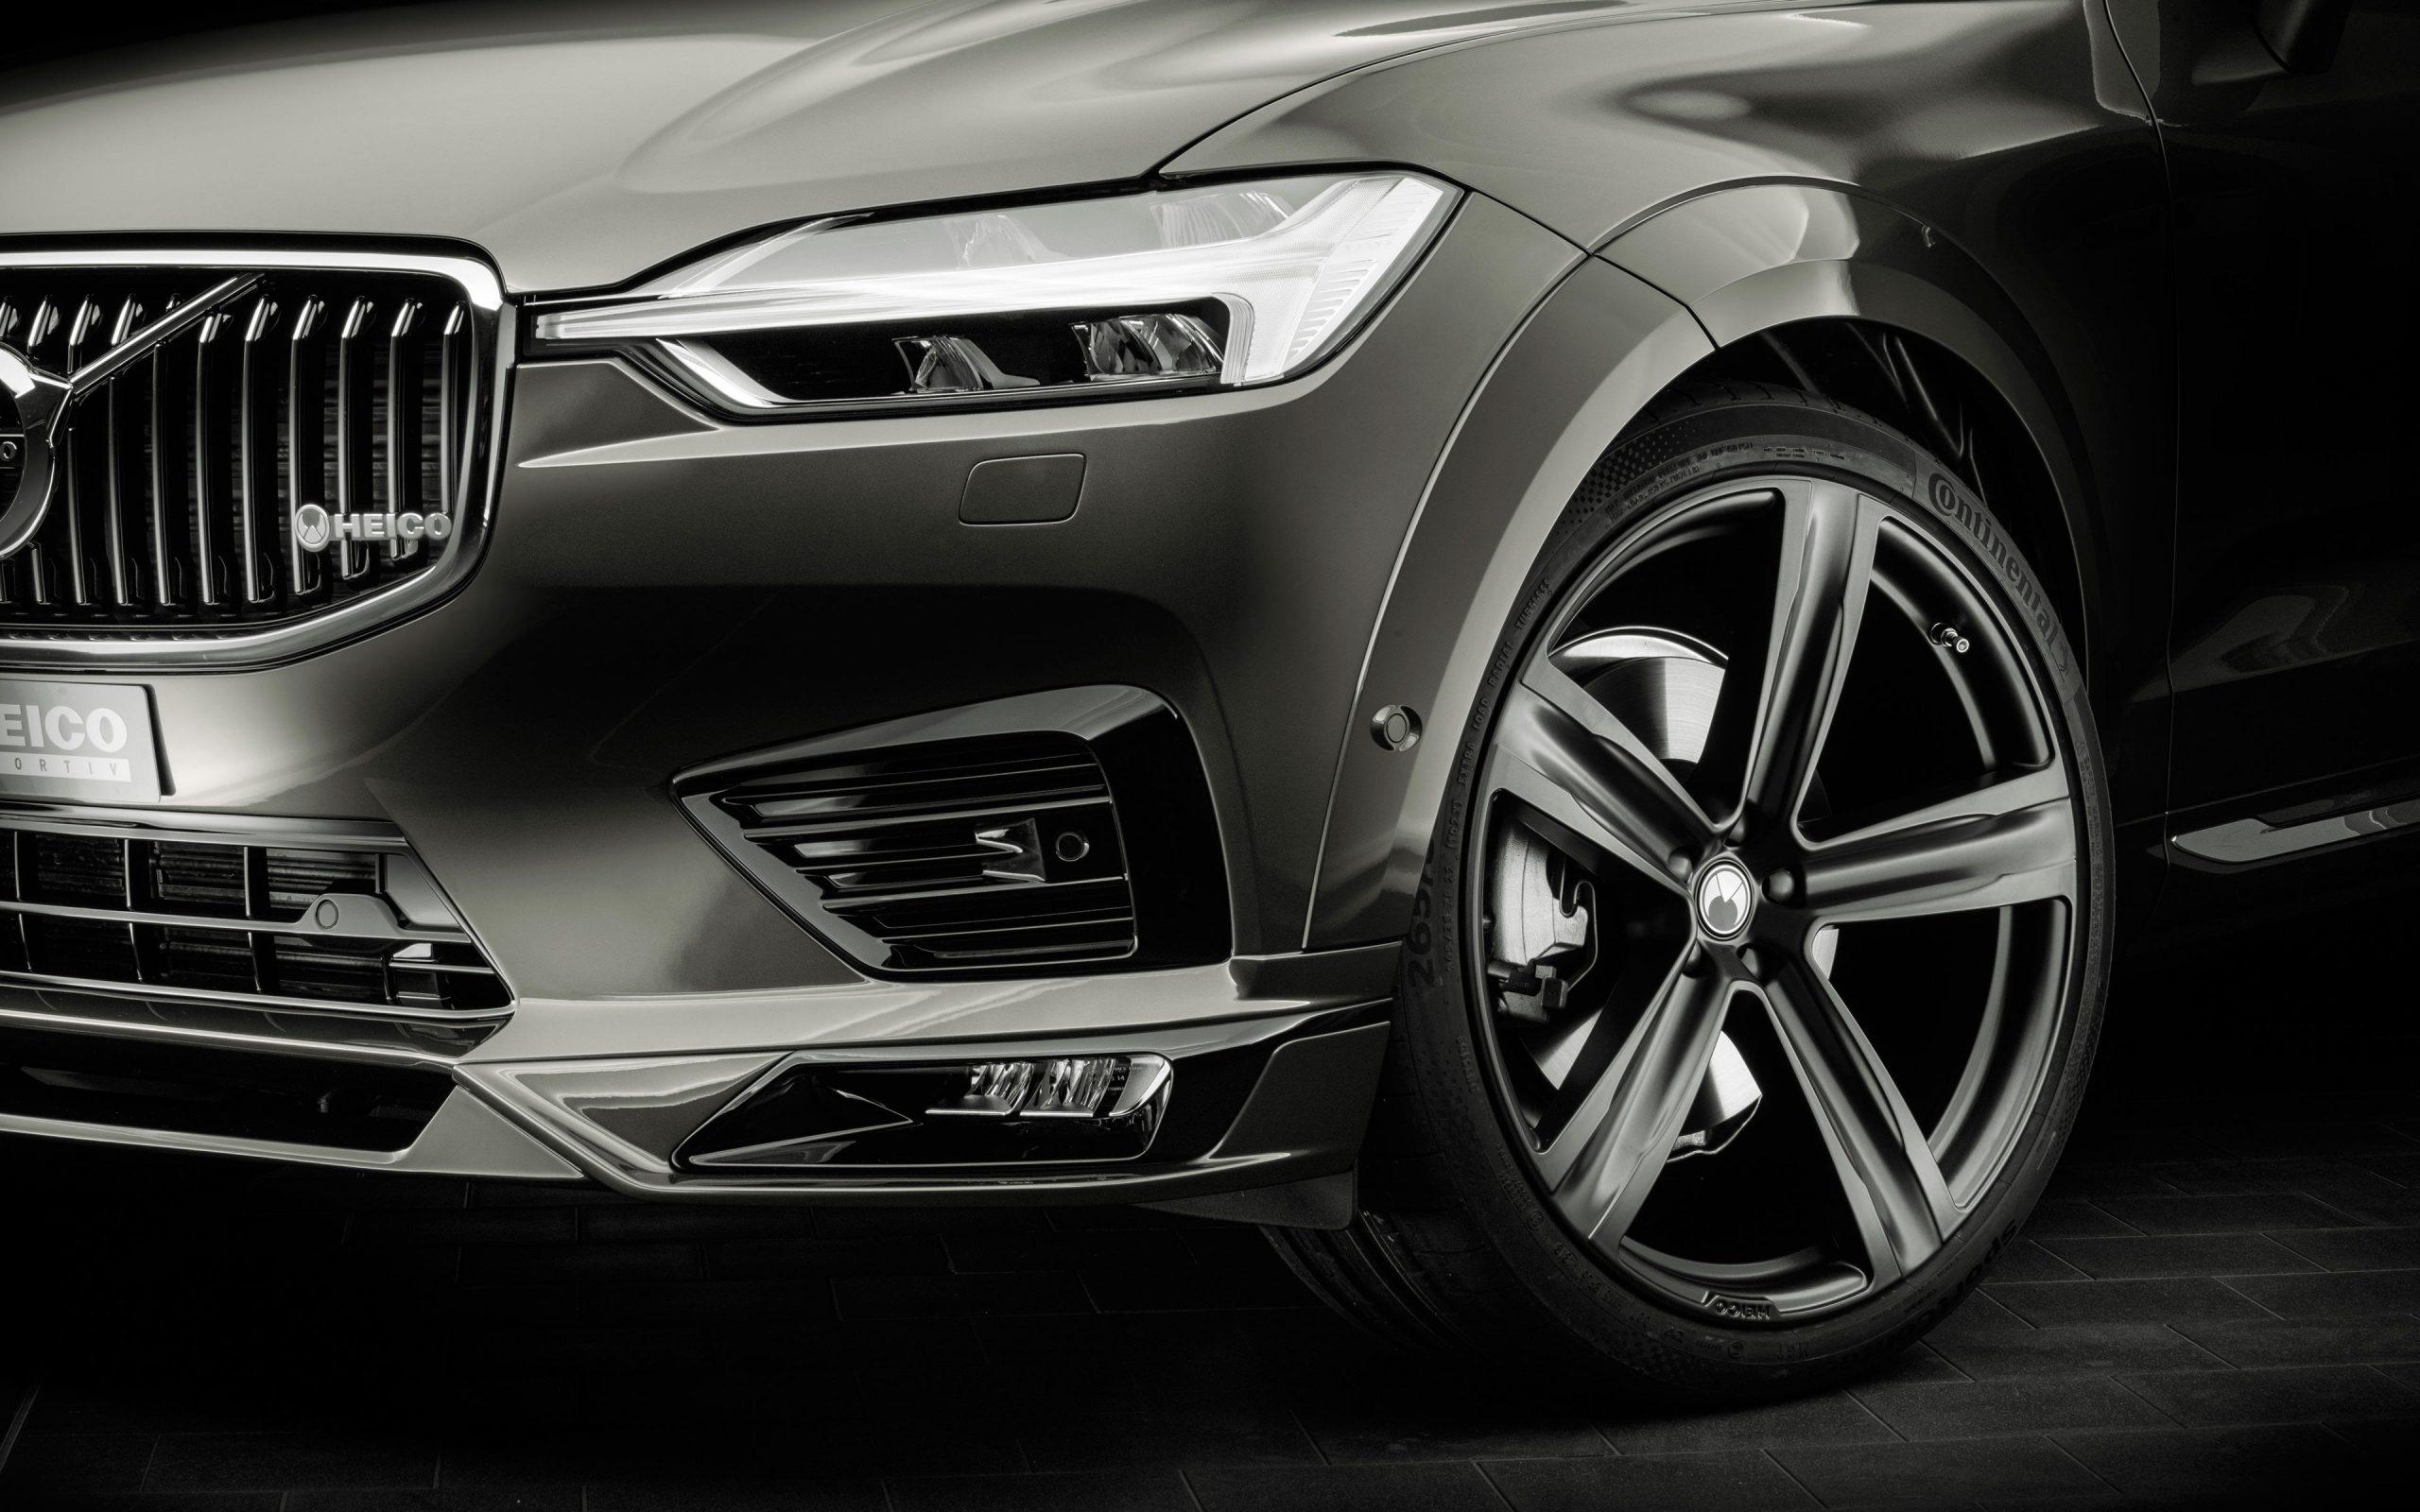 heico-sportiv-volvo-xc60-246-pine-grey-detail-front